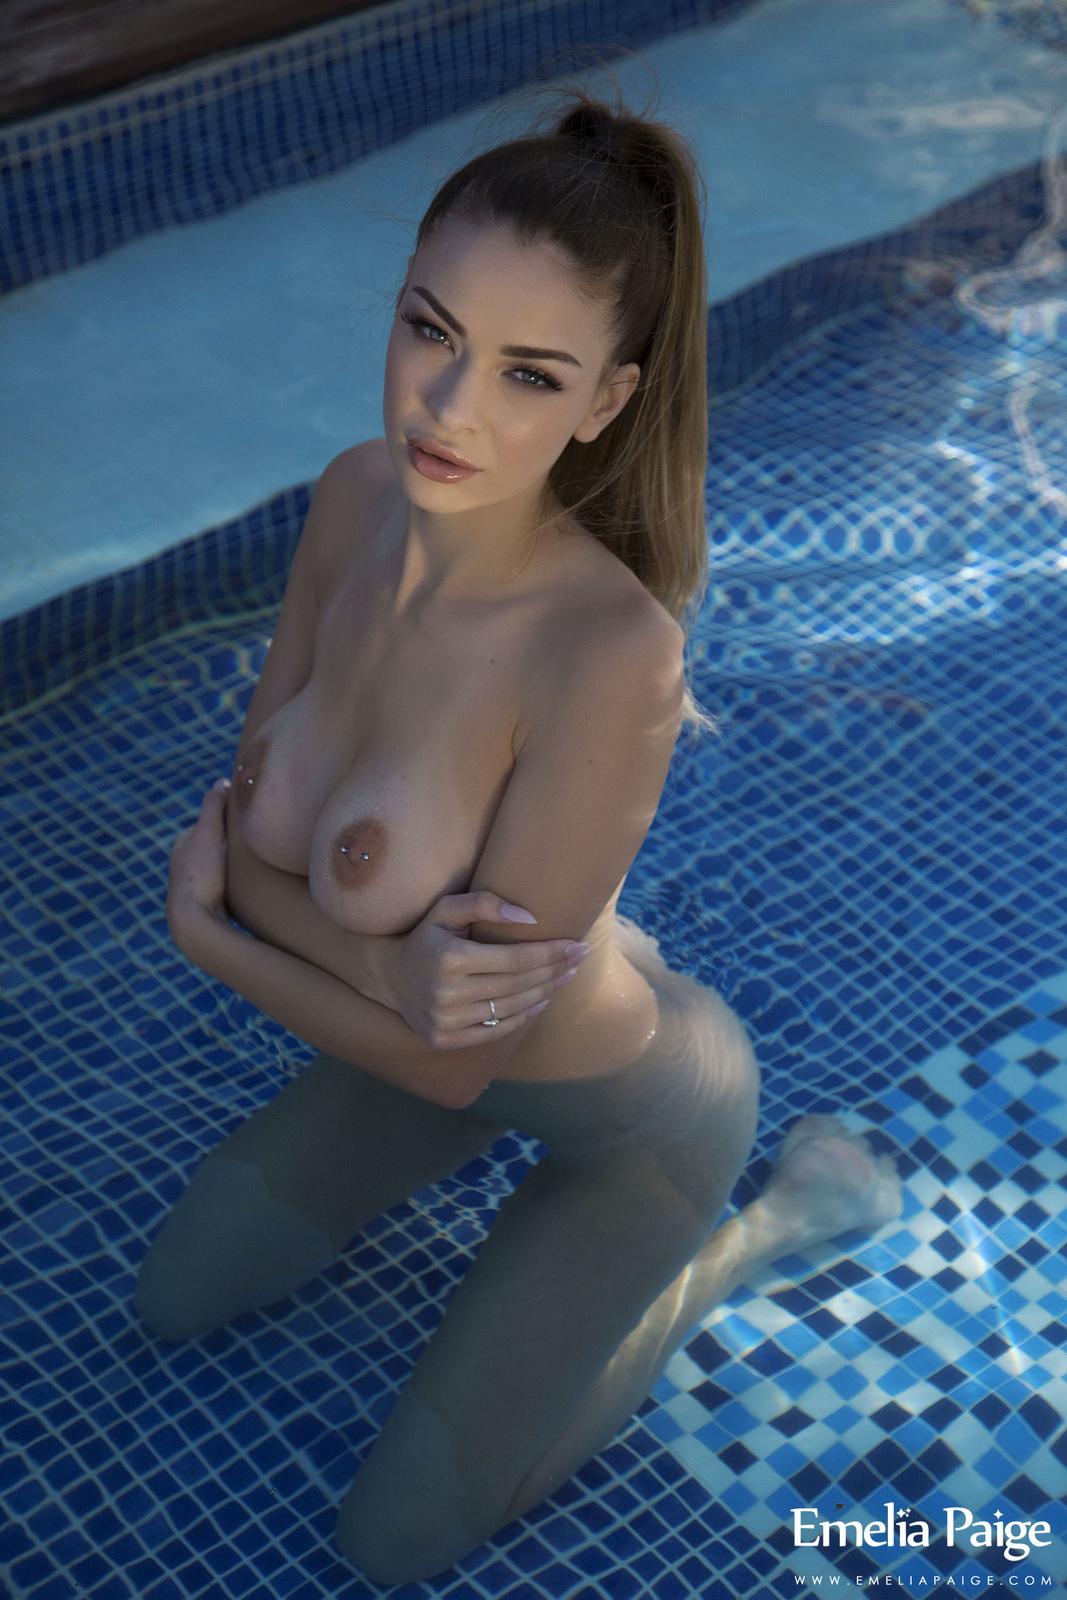 emelia-paige-pool-tits-naked-pink-bikini-wet-33